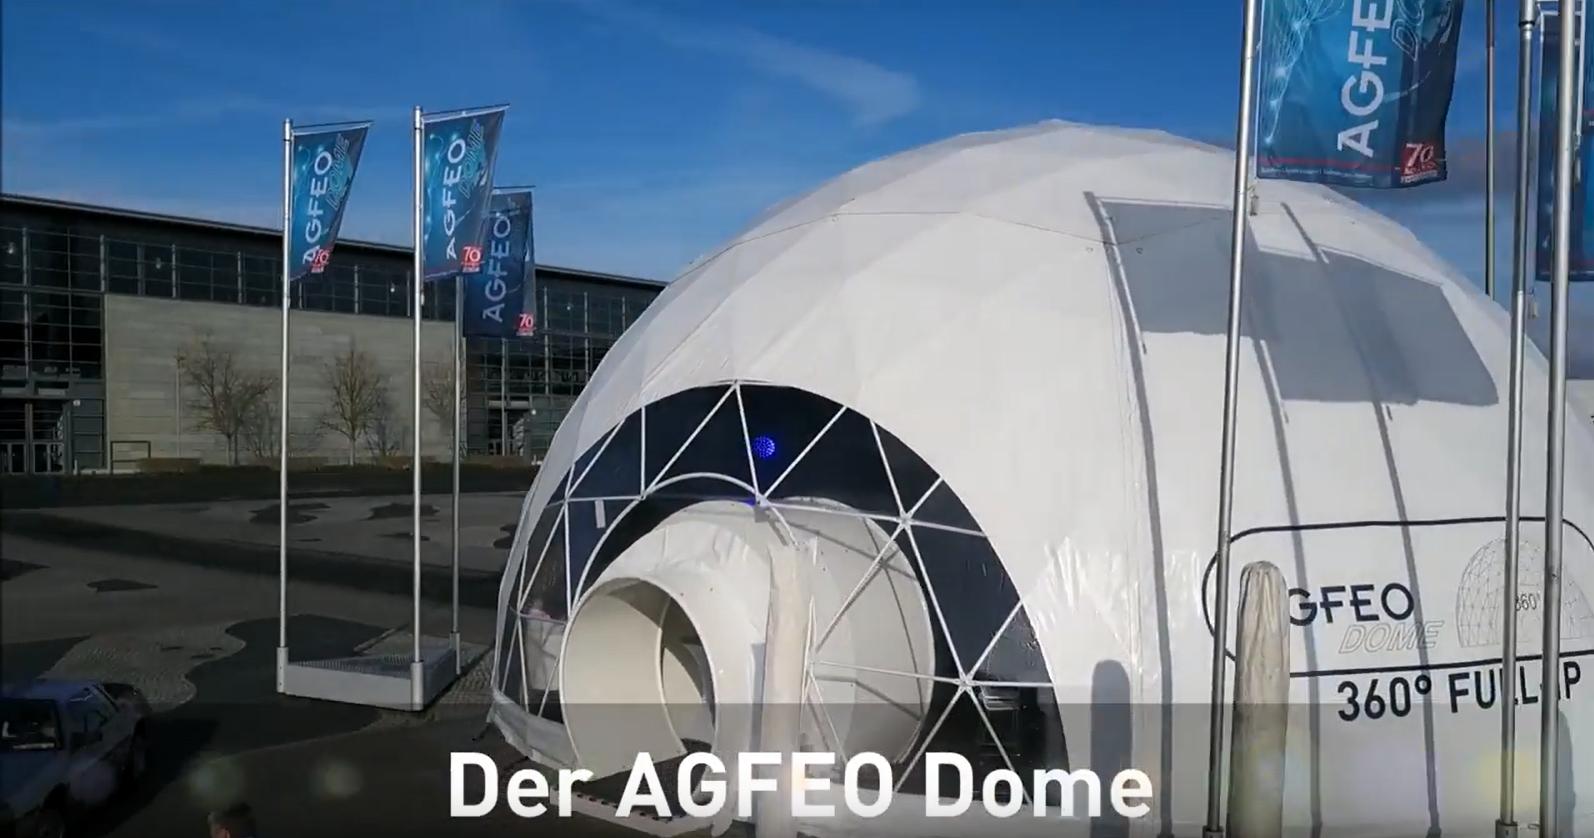 Der_AGFEO_DOM_CeBit_2017